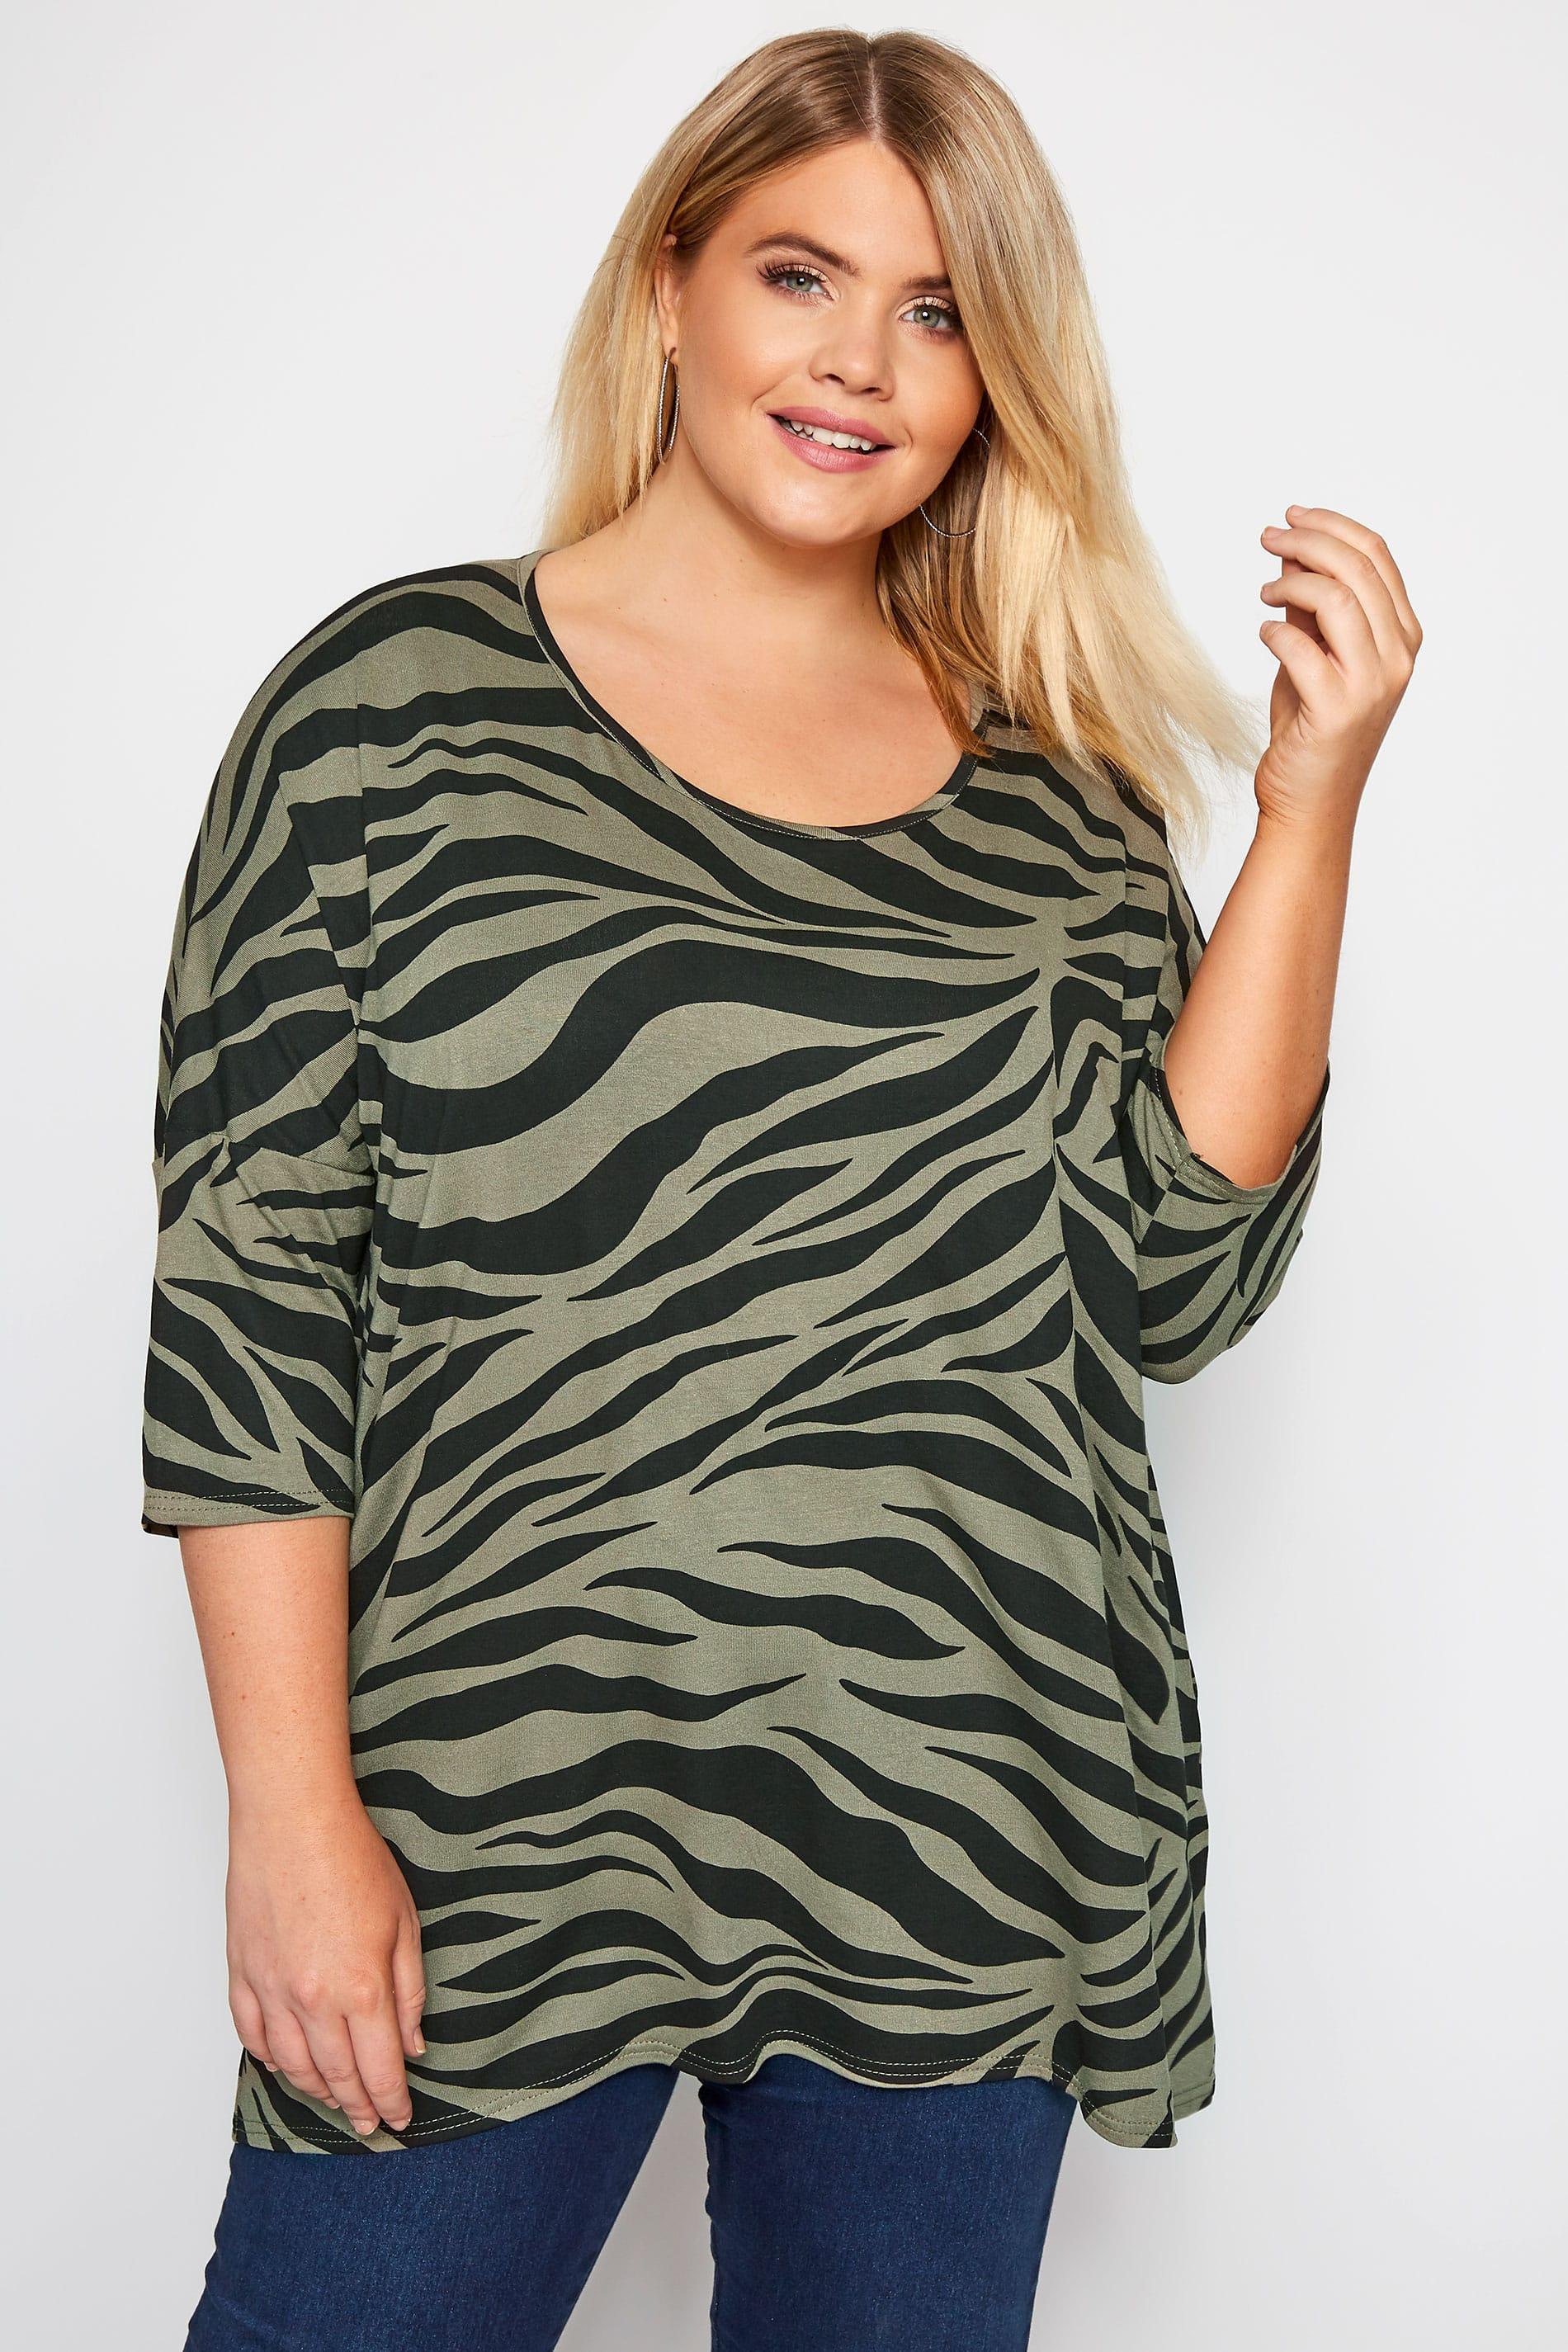 Khaki Zebra Print Top